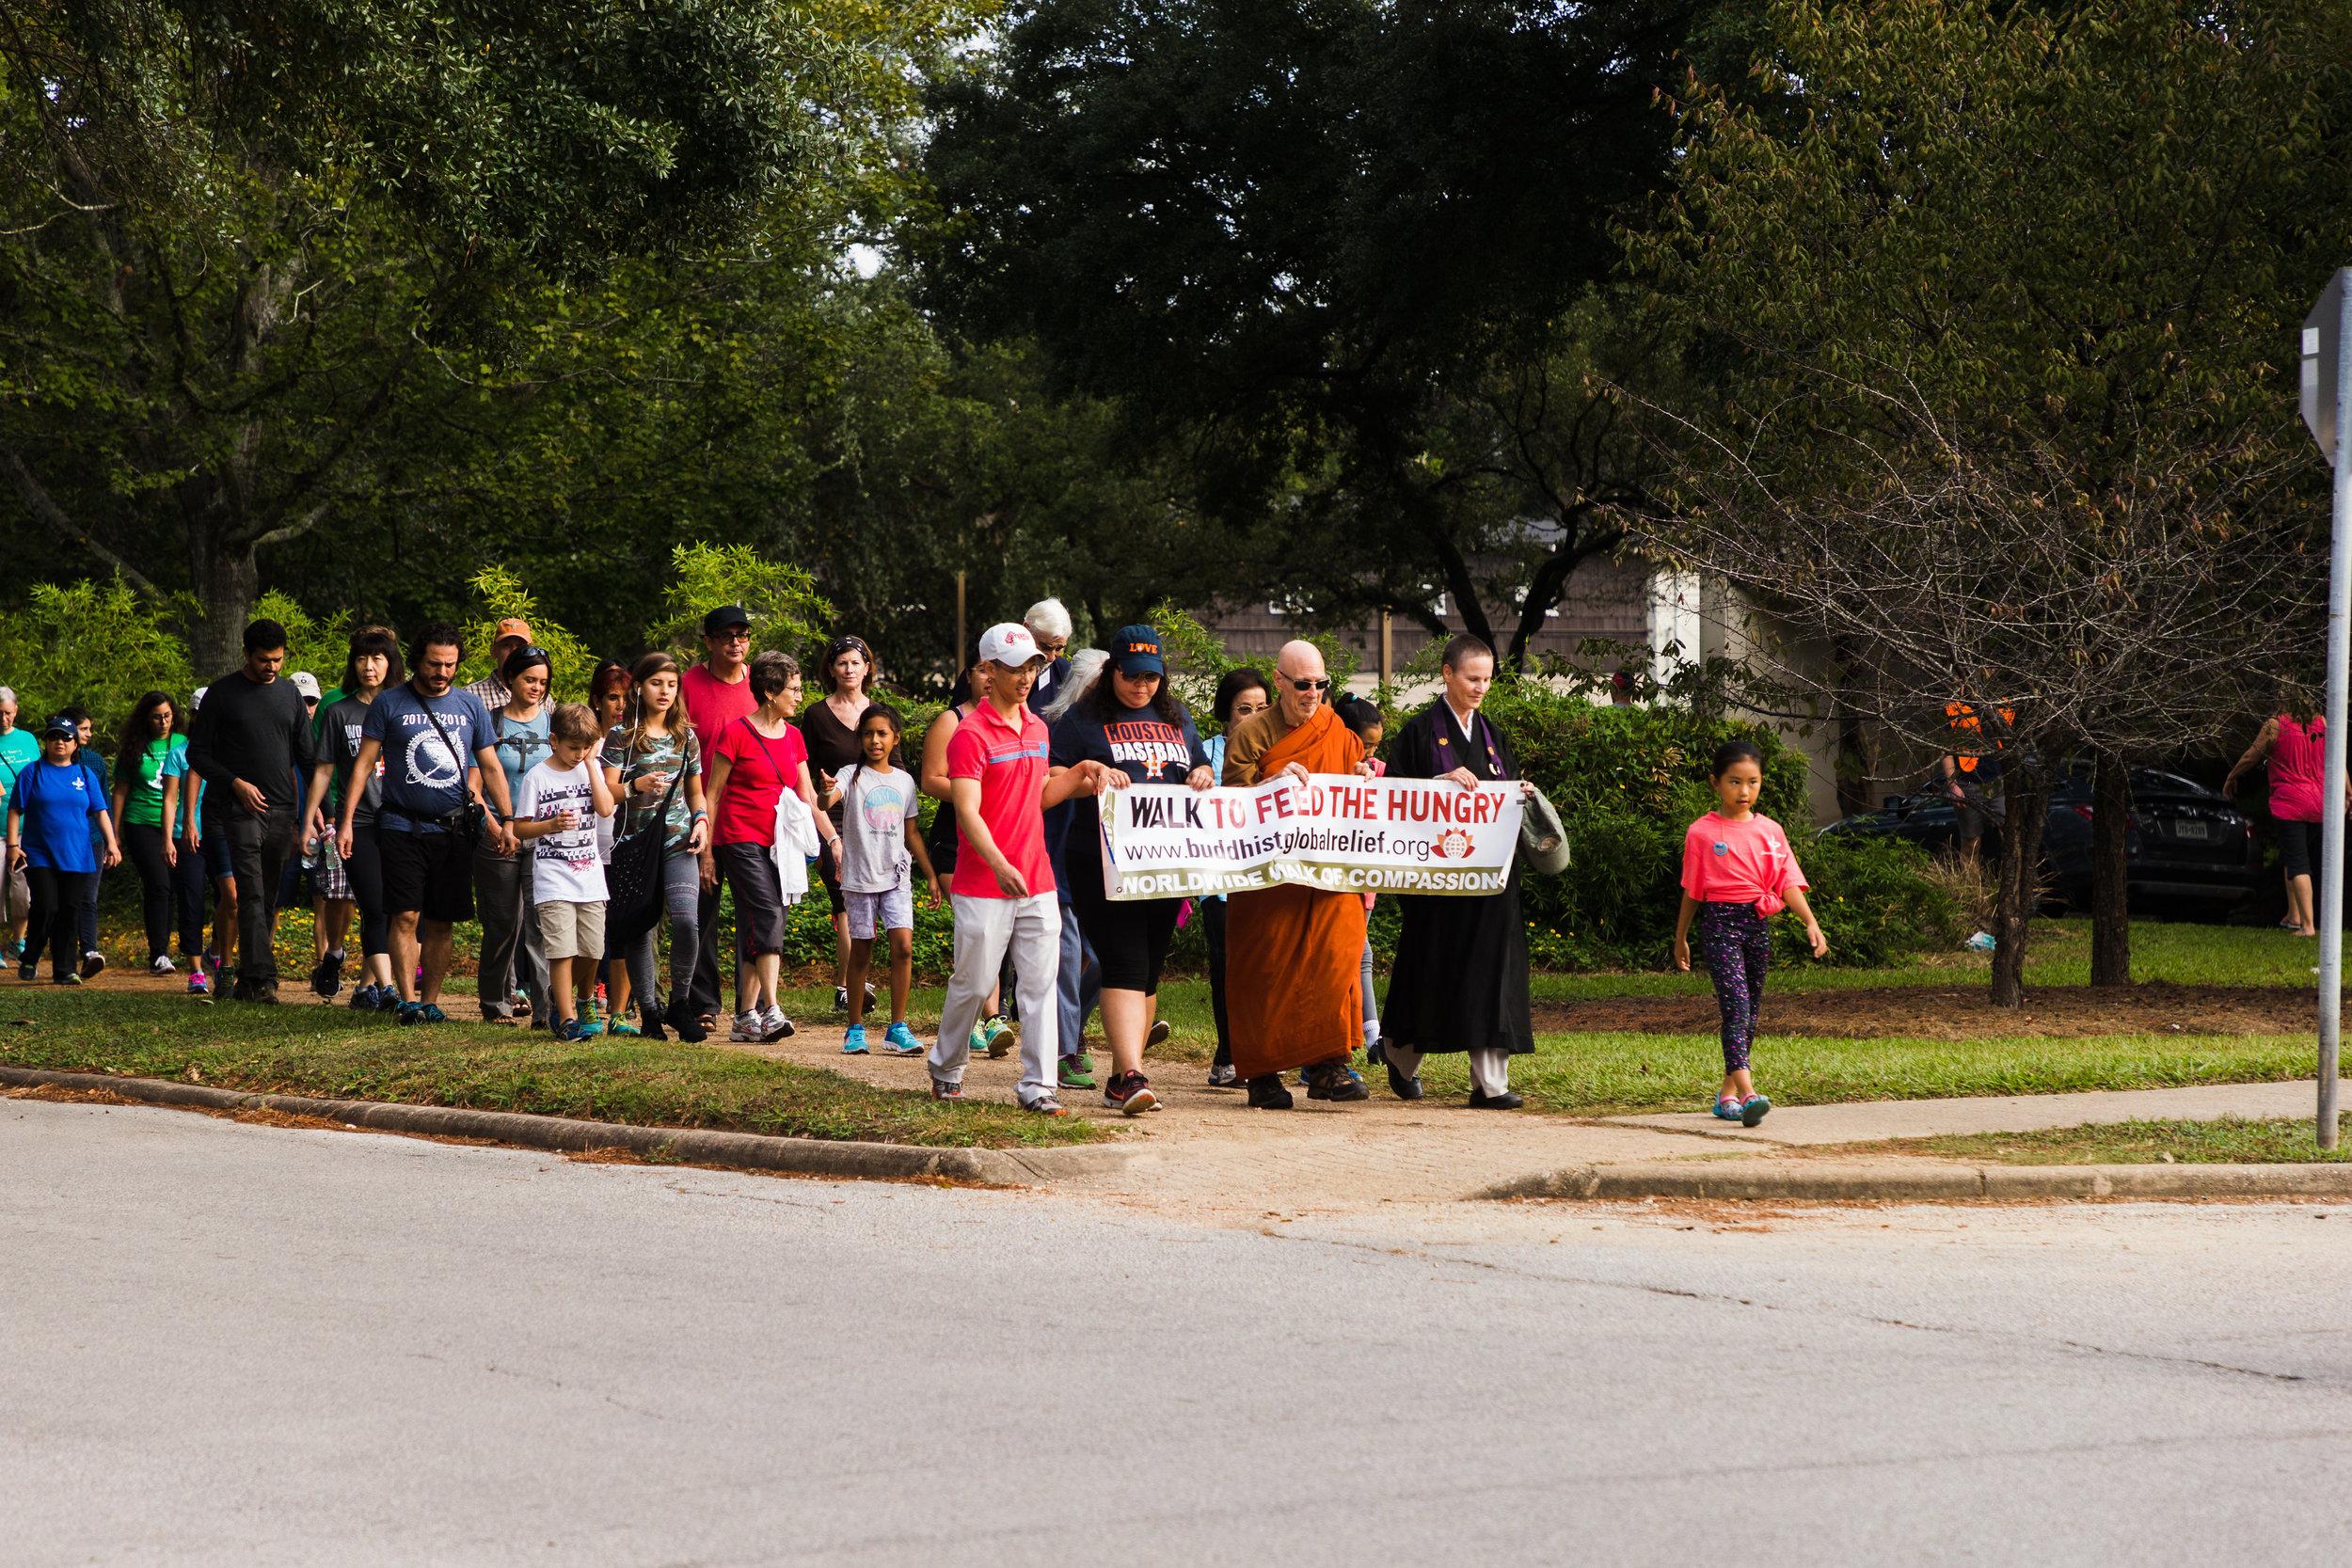 Bhikkhu-Bodhi-Global-Relief-Houston-Zen-Walk-57.jpg